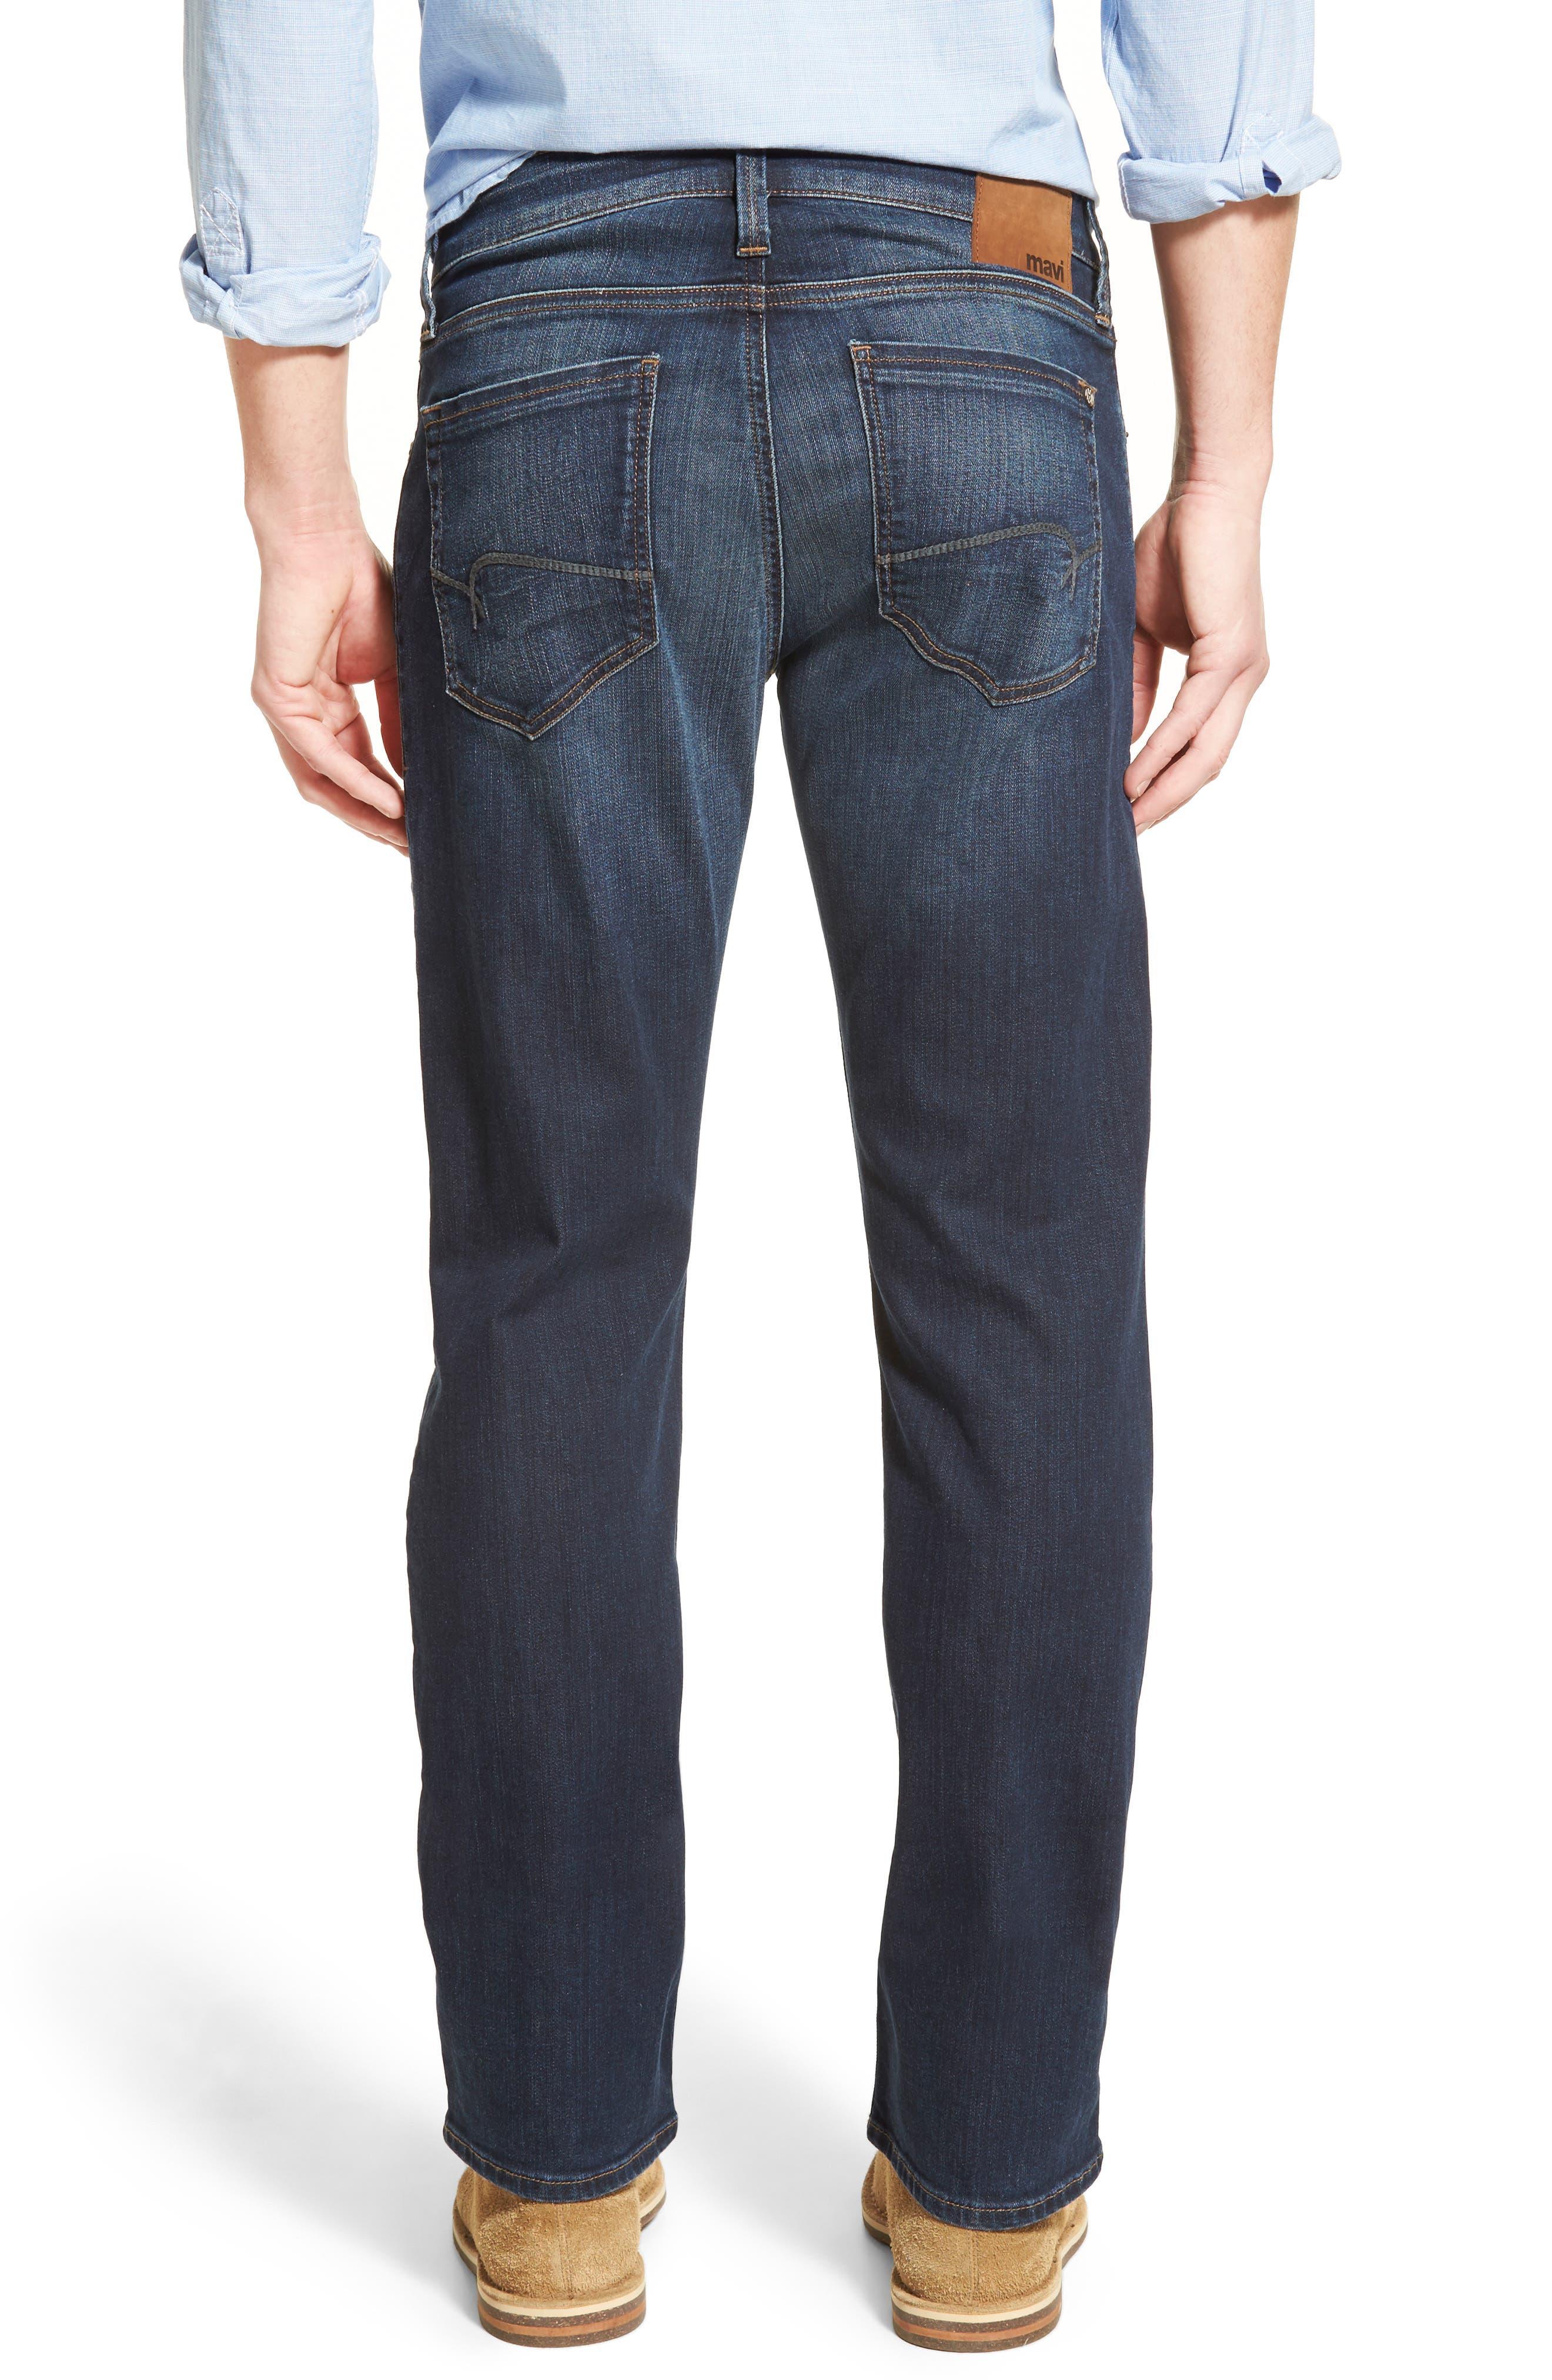 MAVI JEANS,                             Zach Straight Leg Jeans,                             Alternate thumbnail 2, color,                             DARK BRUSHED WILLIAMSBURG